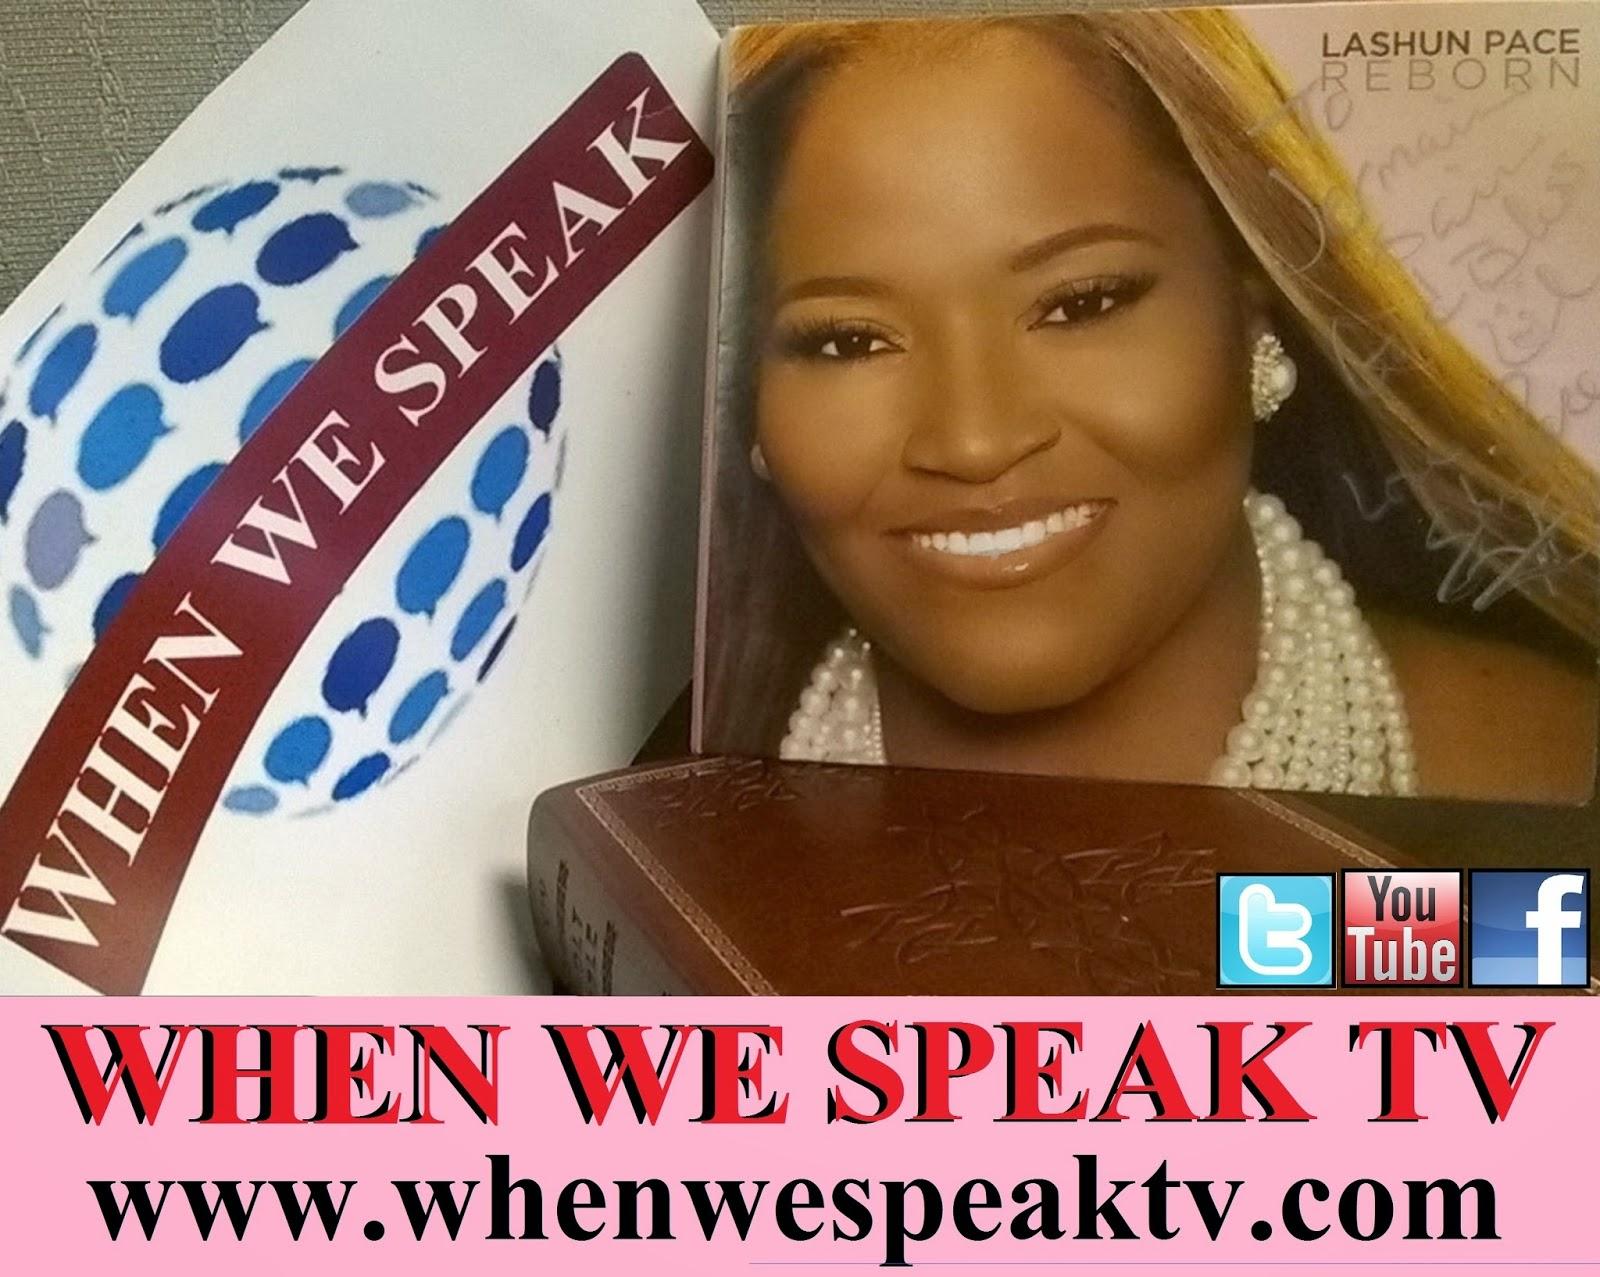 www.whenwespeaktv.com